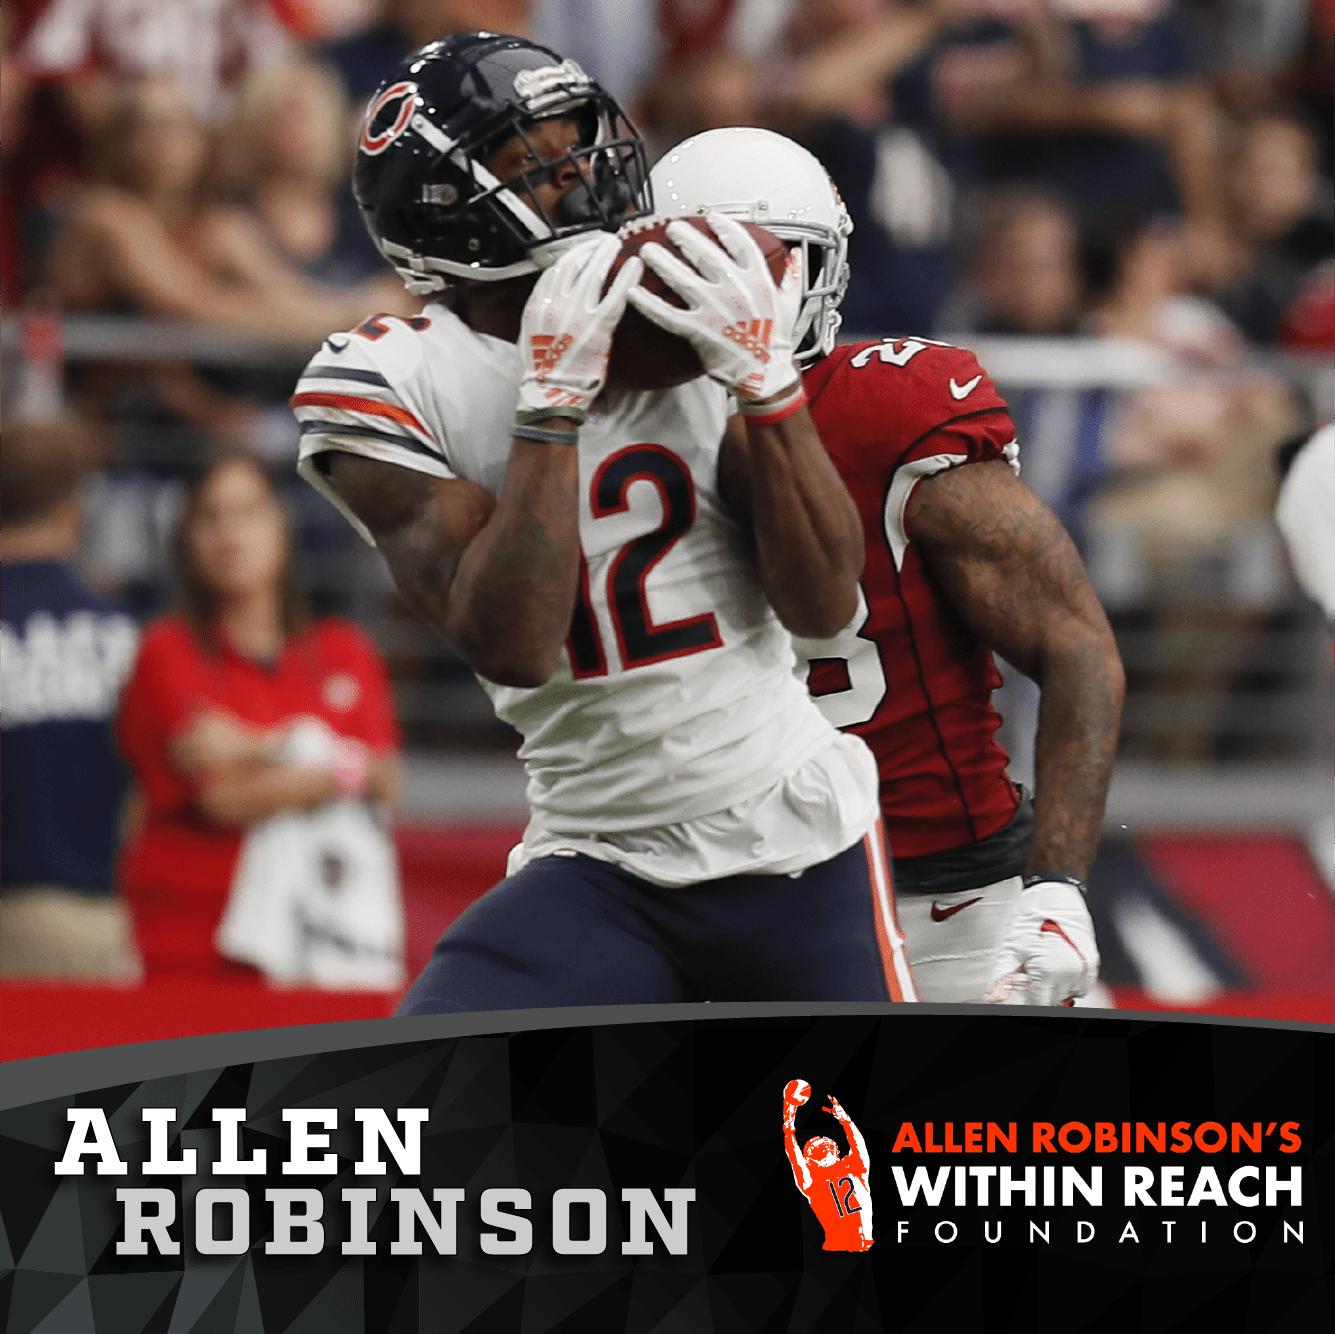 Allen Robinson